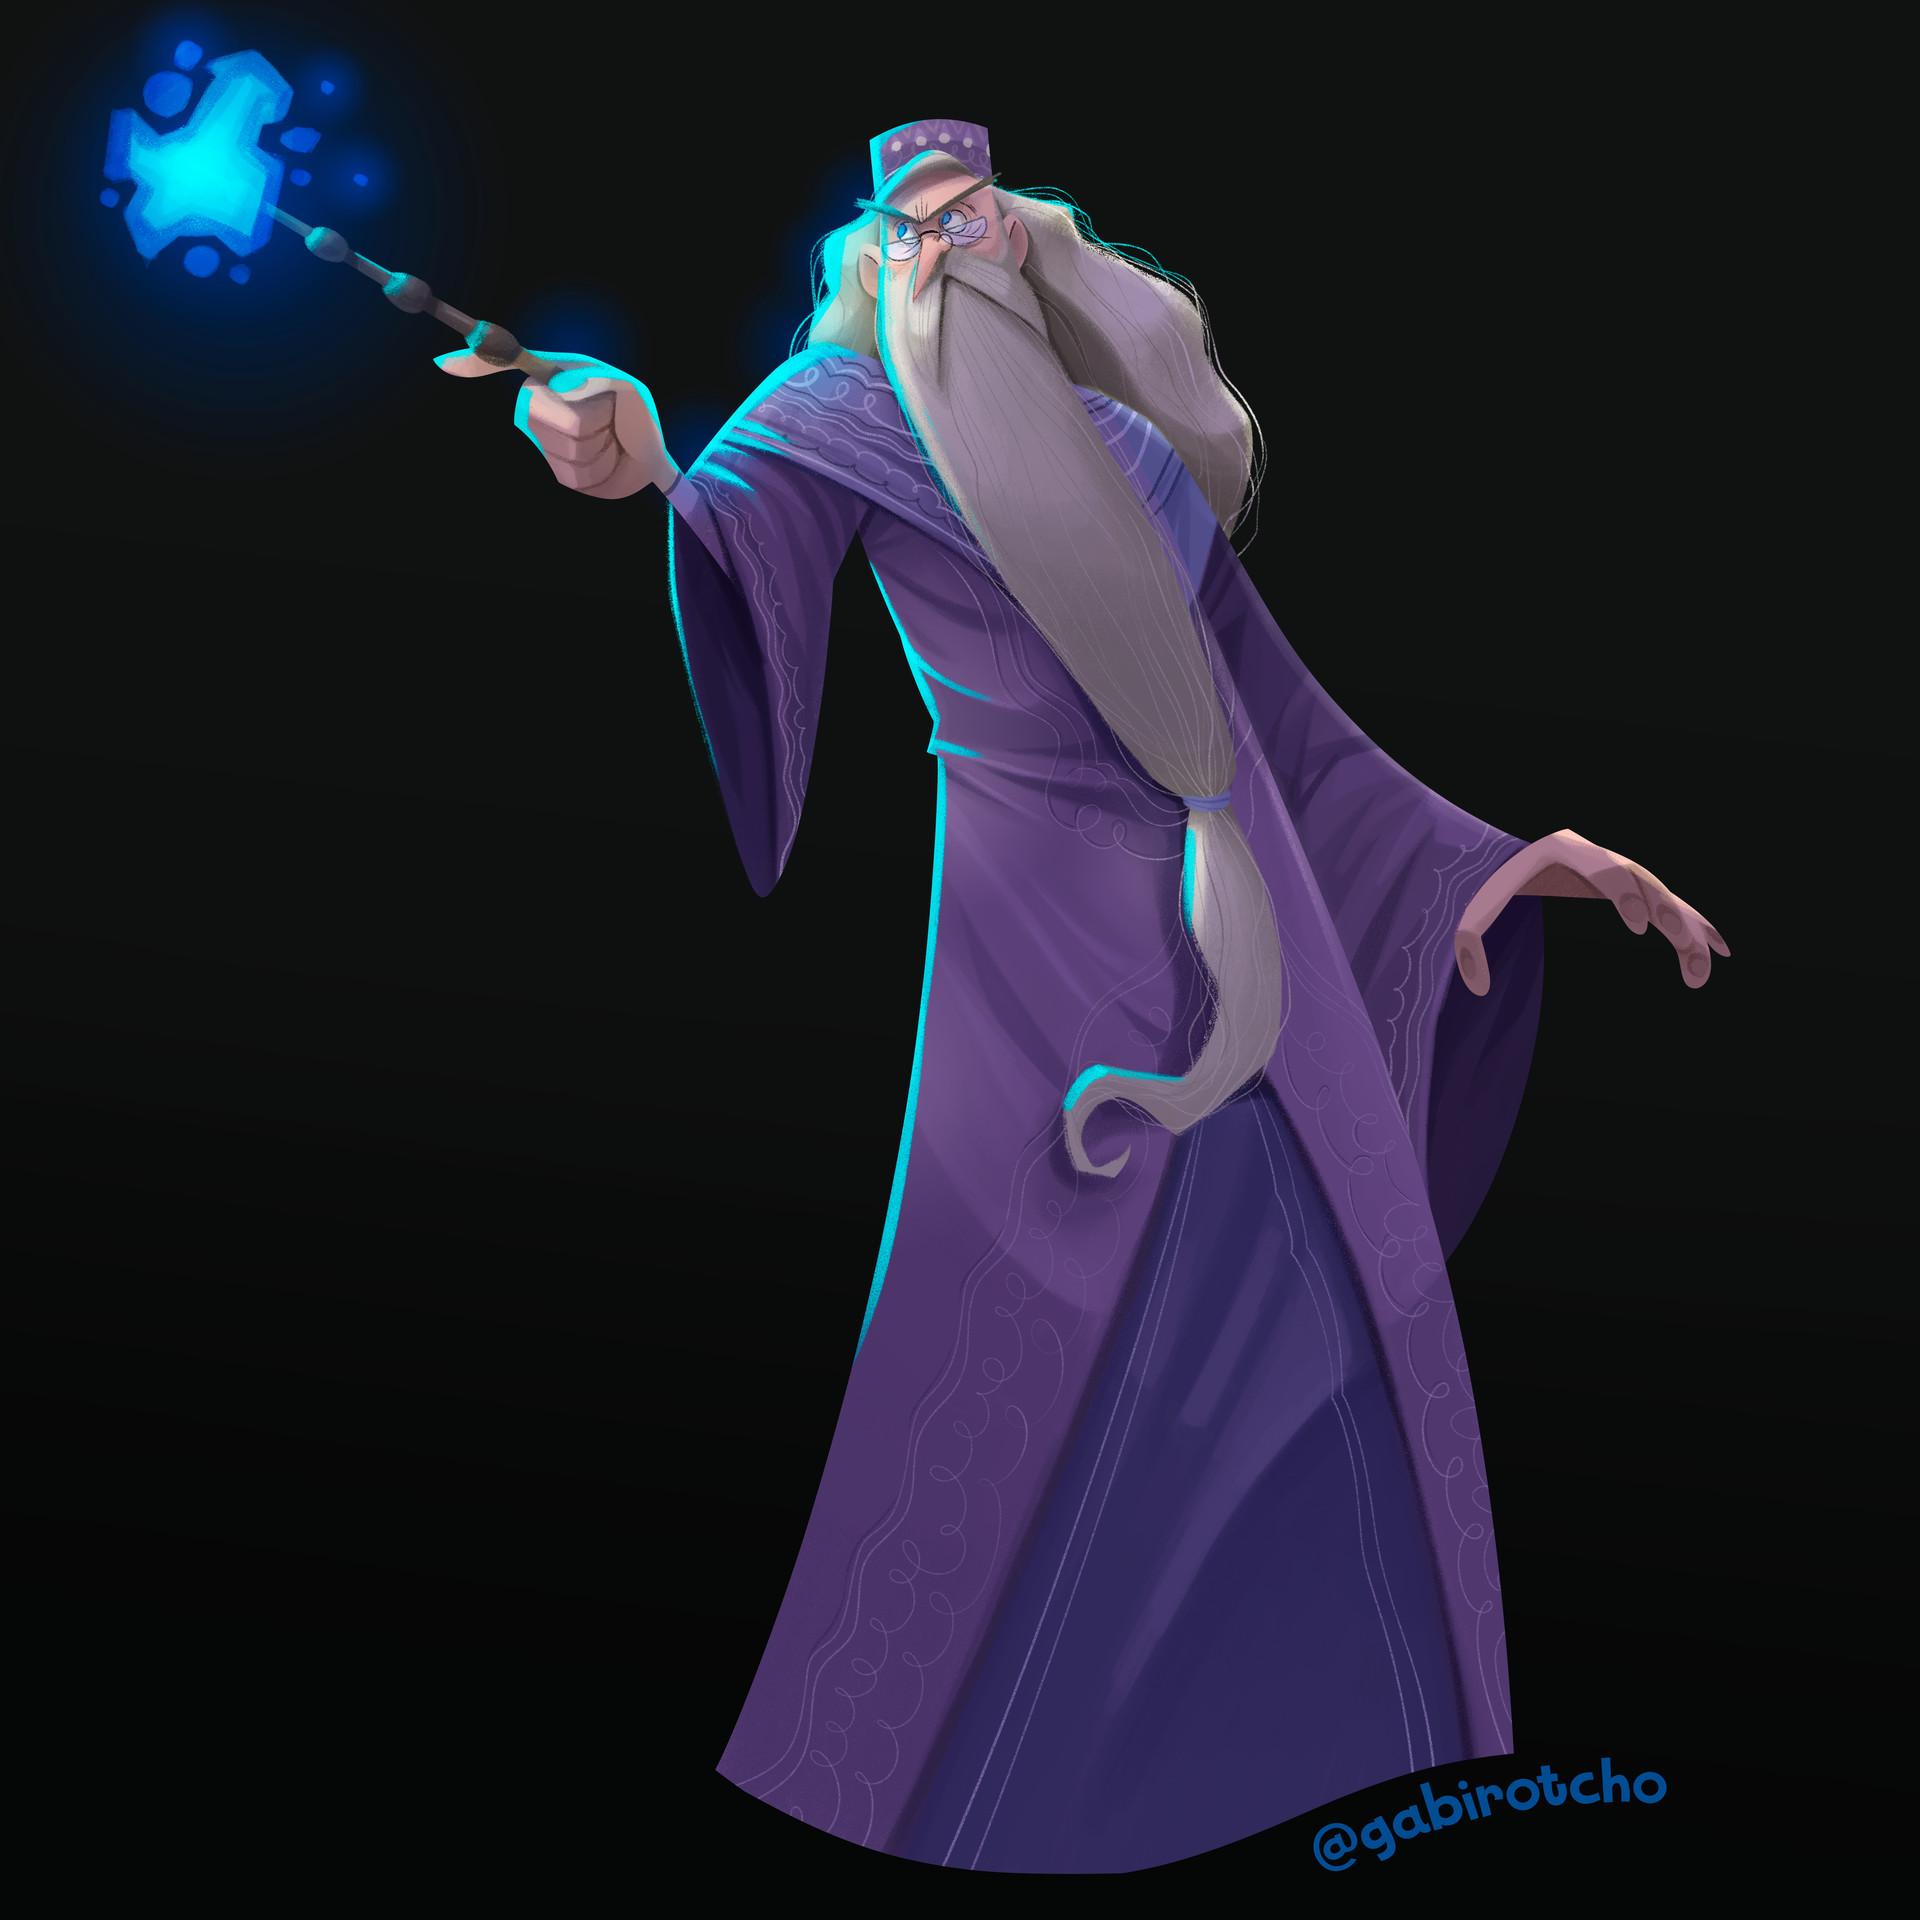 Gabirotcho albus dumbledore